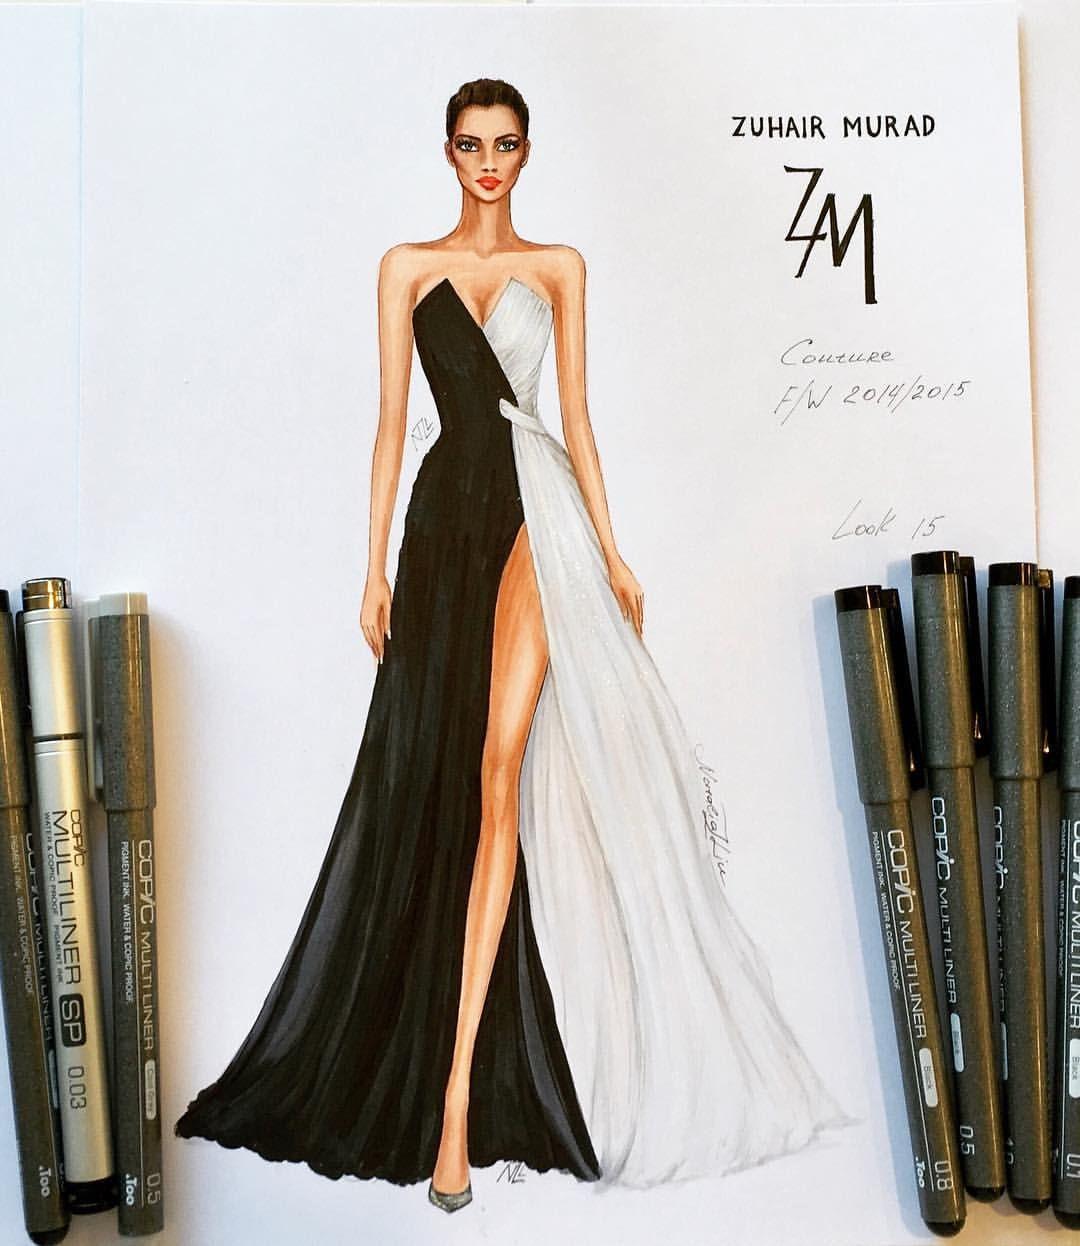 Wedding Gown Illustrations: Pin By Slachi Jain On Slaazi